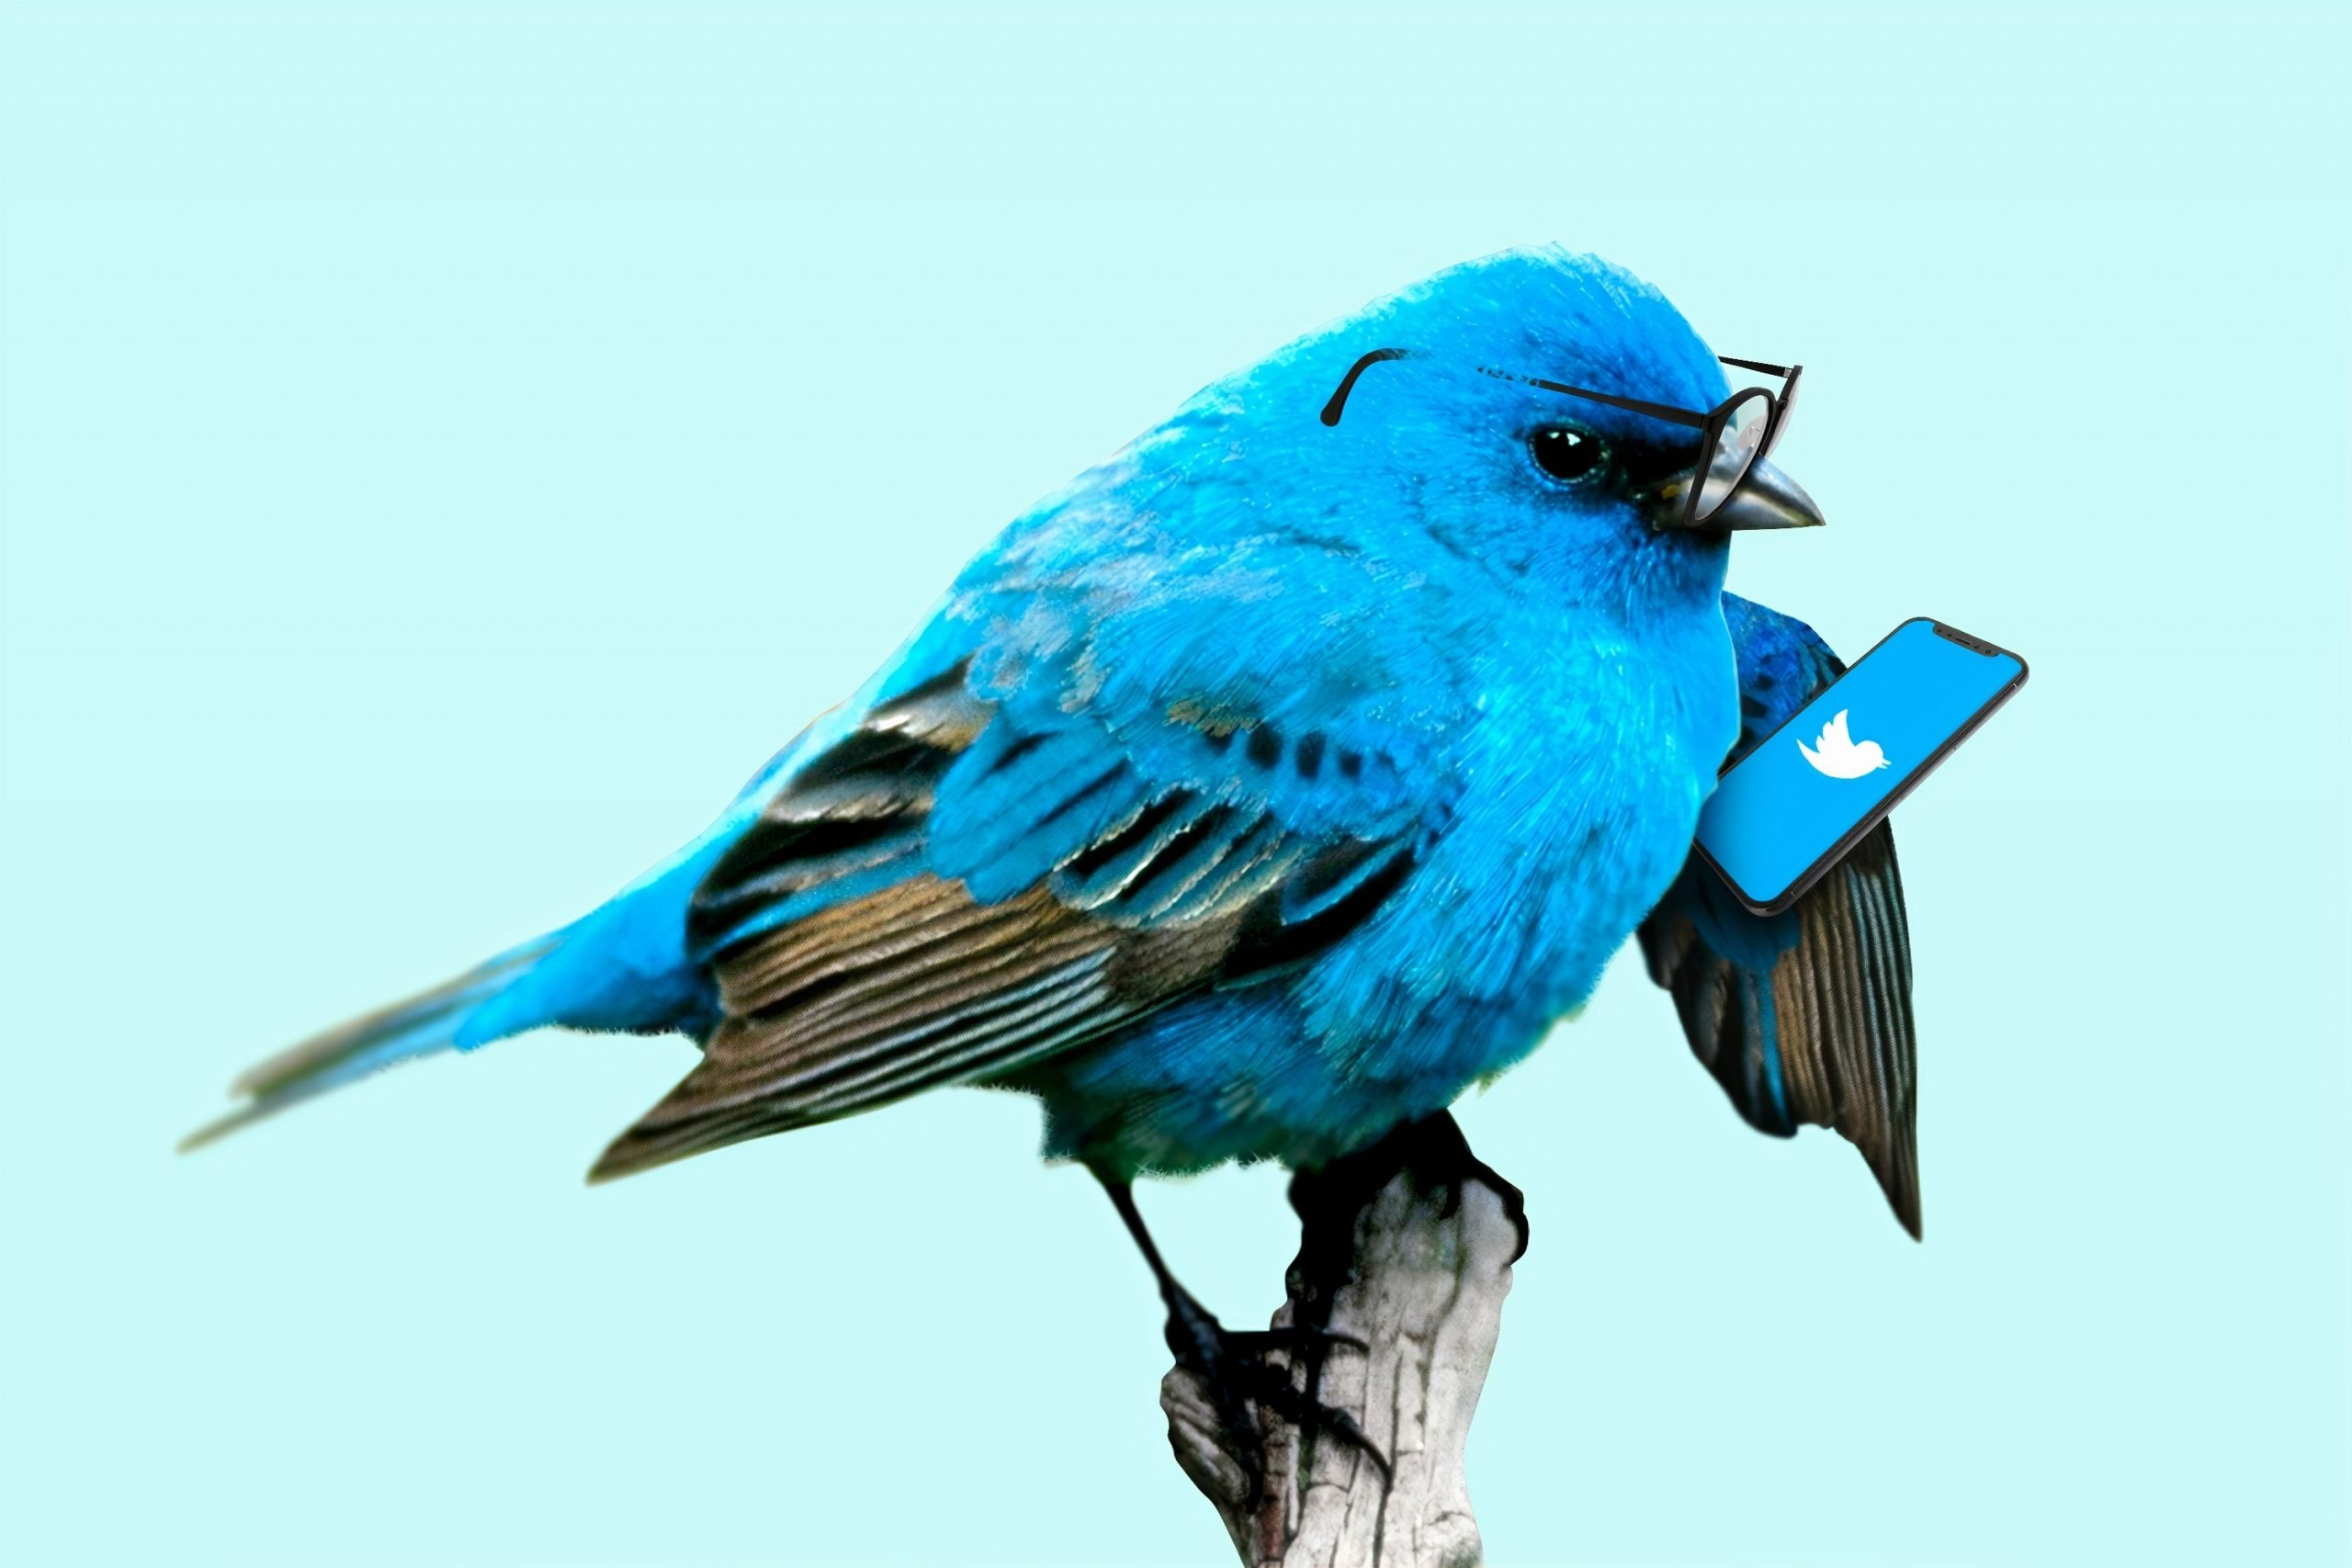 oiseau bleu tenant un téléphone